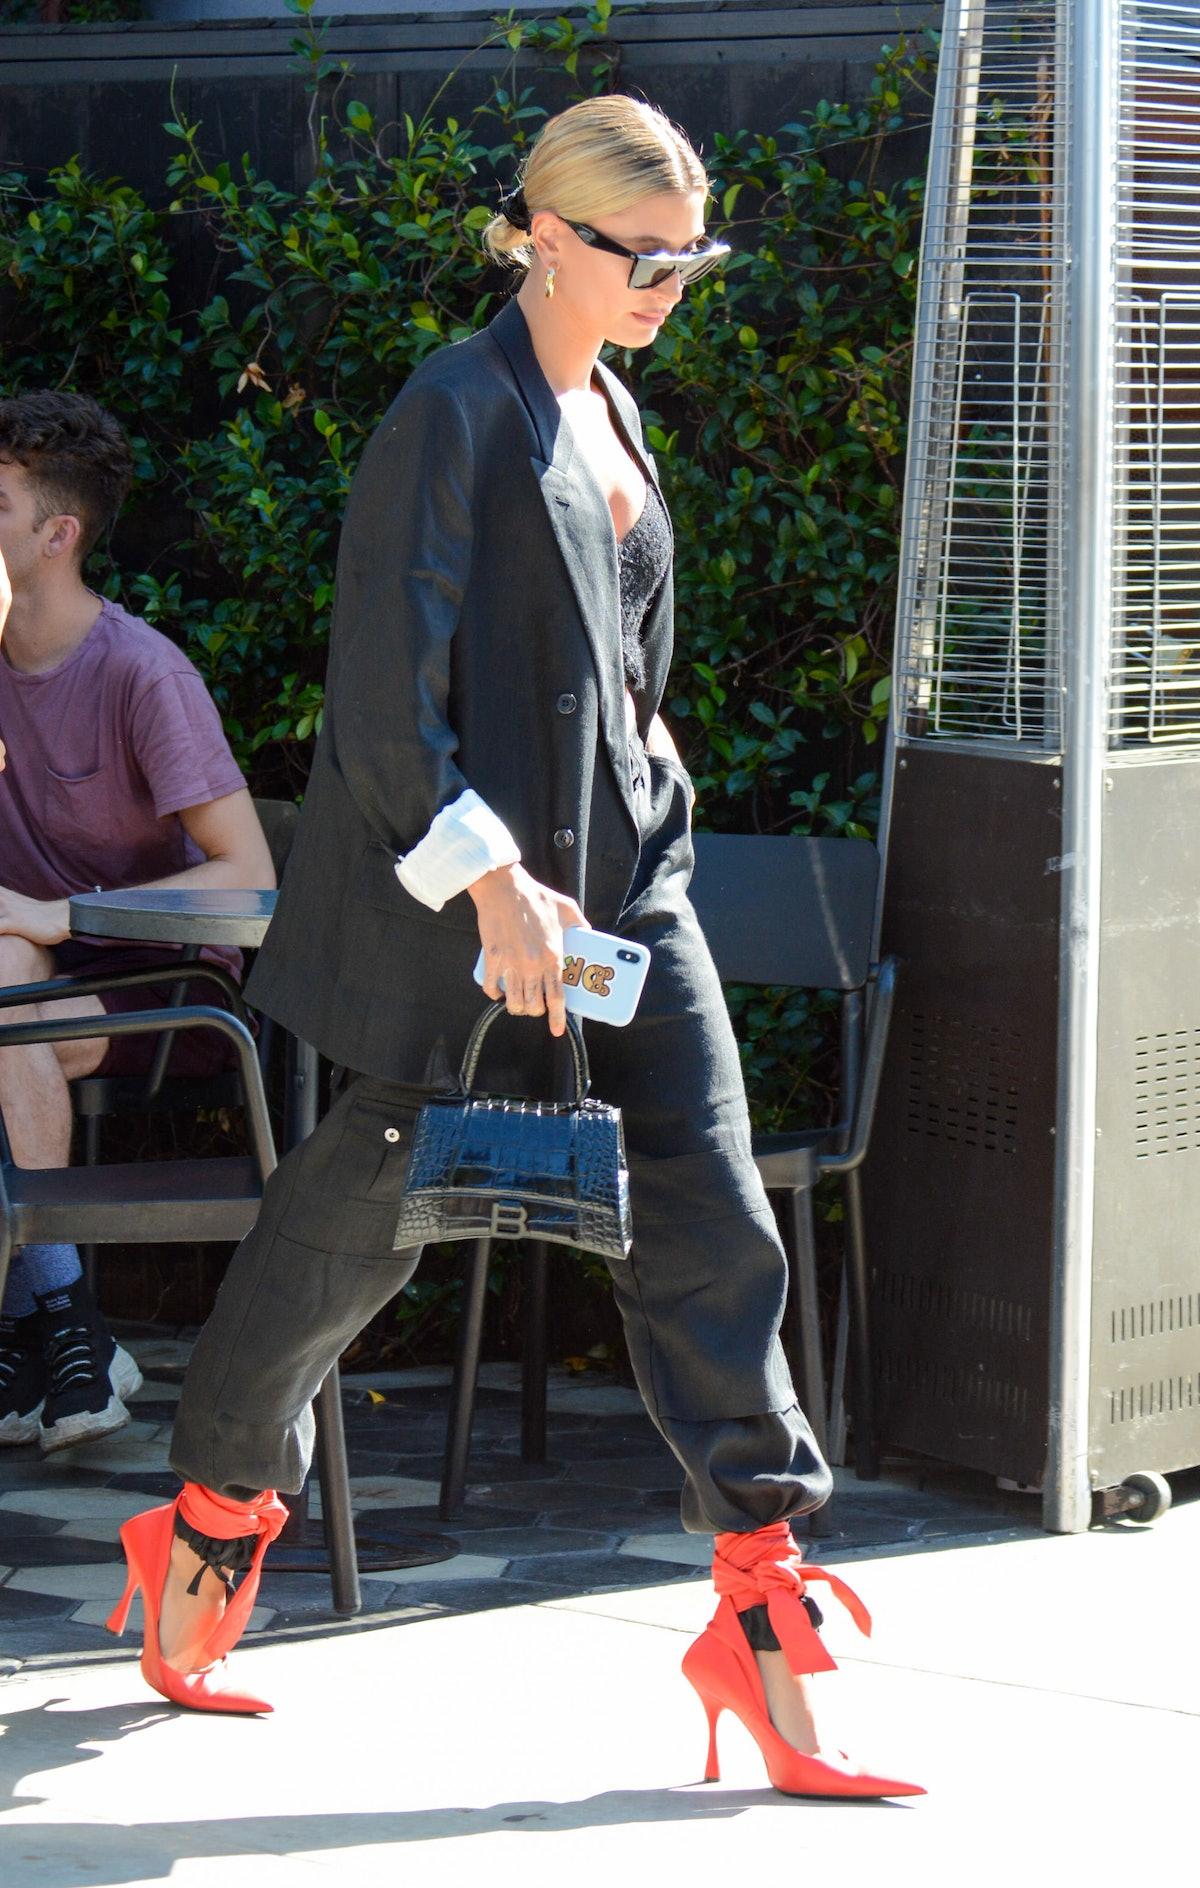 Hailey Bieber is seen in Los Angeles, California in August 2019.